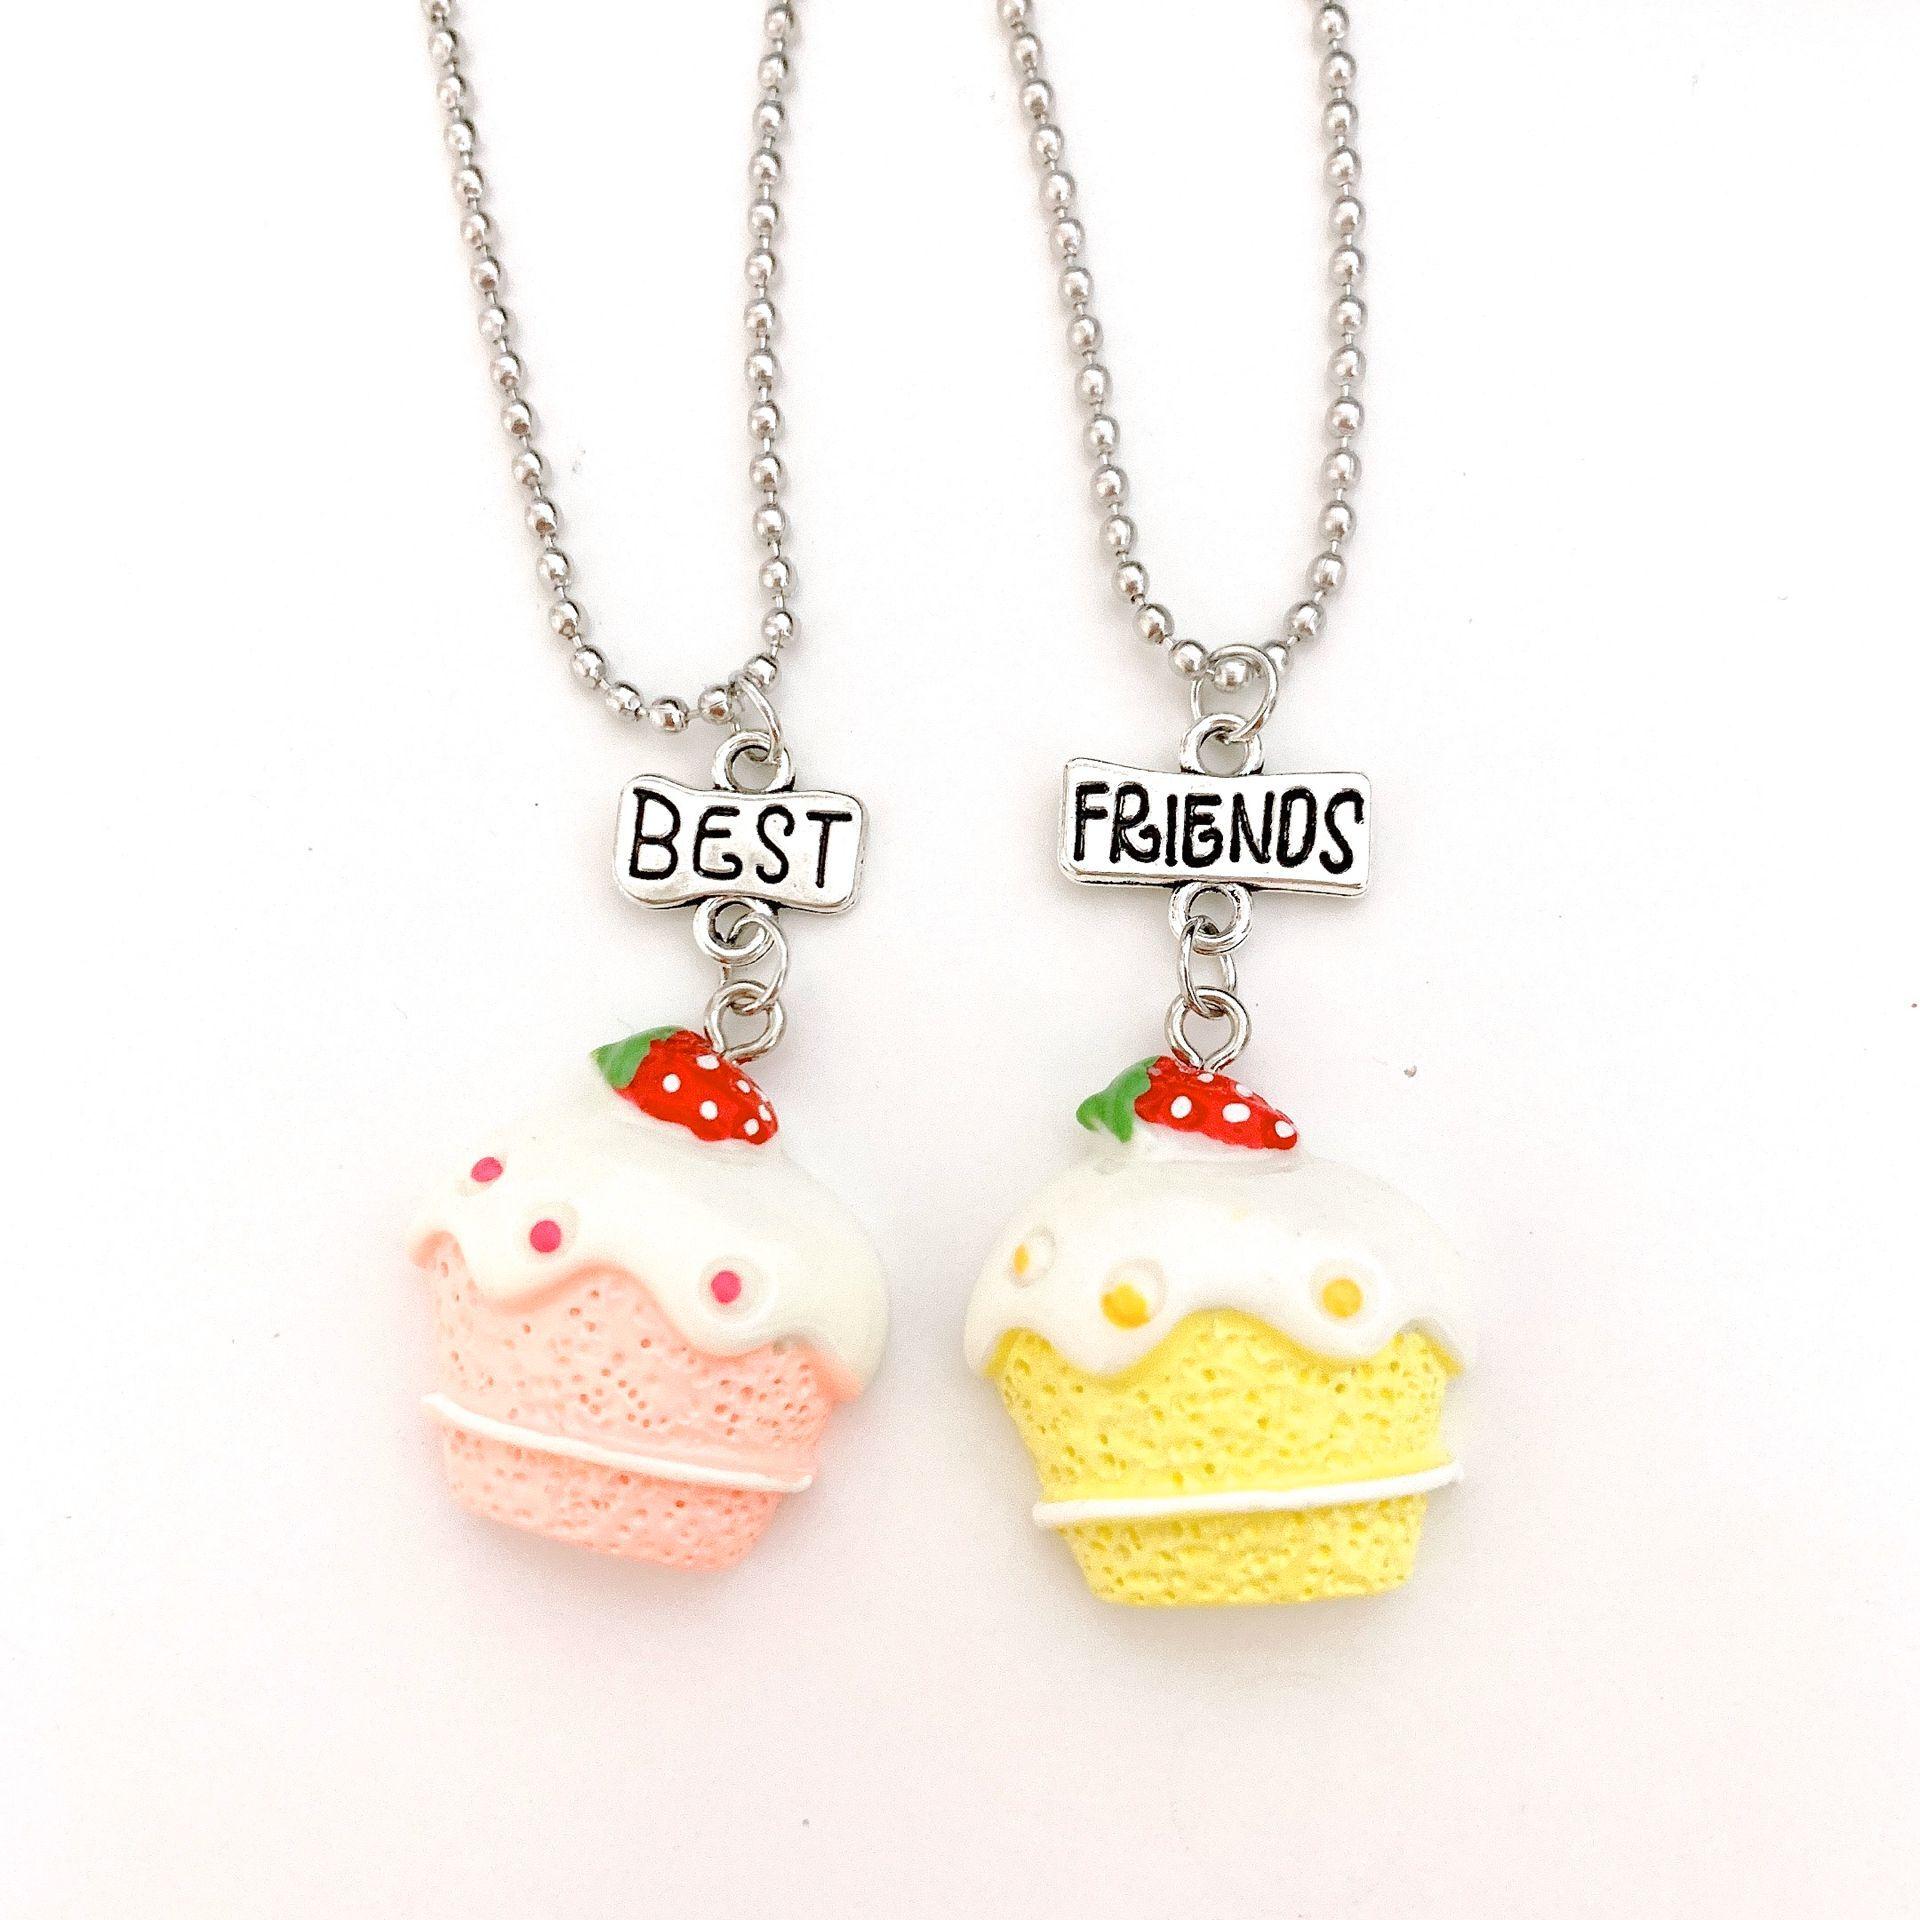 Yellow Pink Strawberry Cake Food Pendant Bff Necklace Children Best Friends 2 Boys Girls Friendship Jewelry Birthday Gift Pendant Necklaces Aliexpress